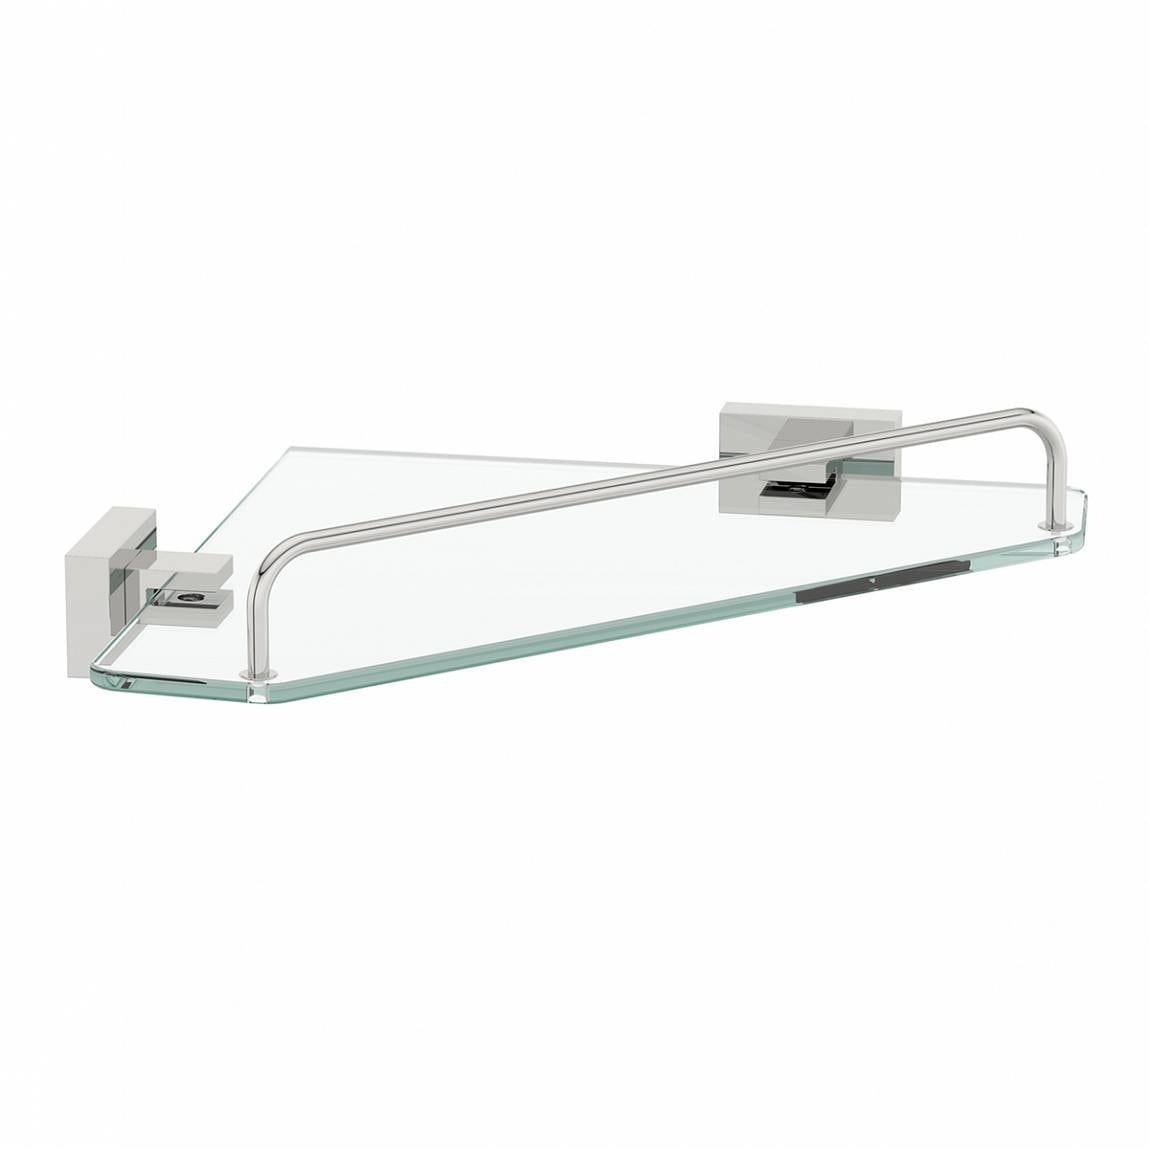 Cubik glass corner shelf